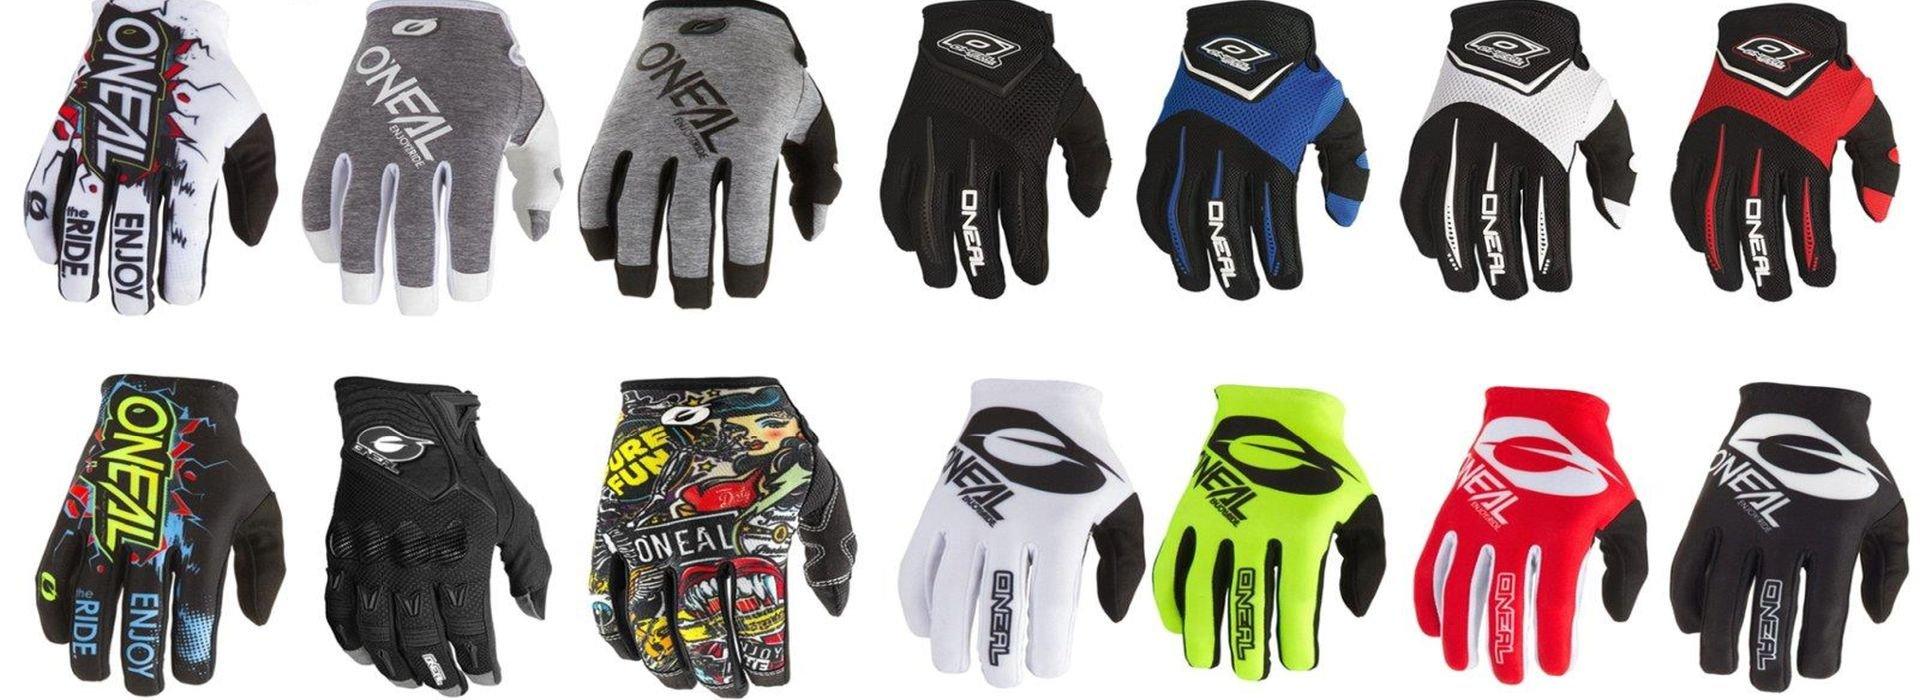 ONeal Butch Carbon Glove Black L//9/